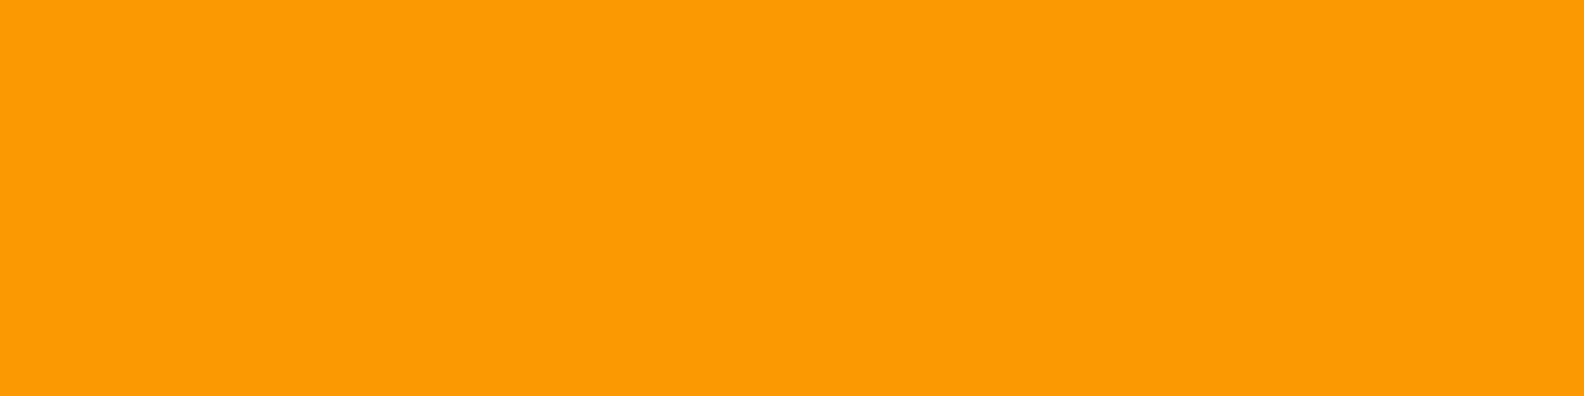 1584x396 Orange RYB Solid Color Background